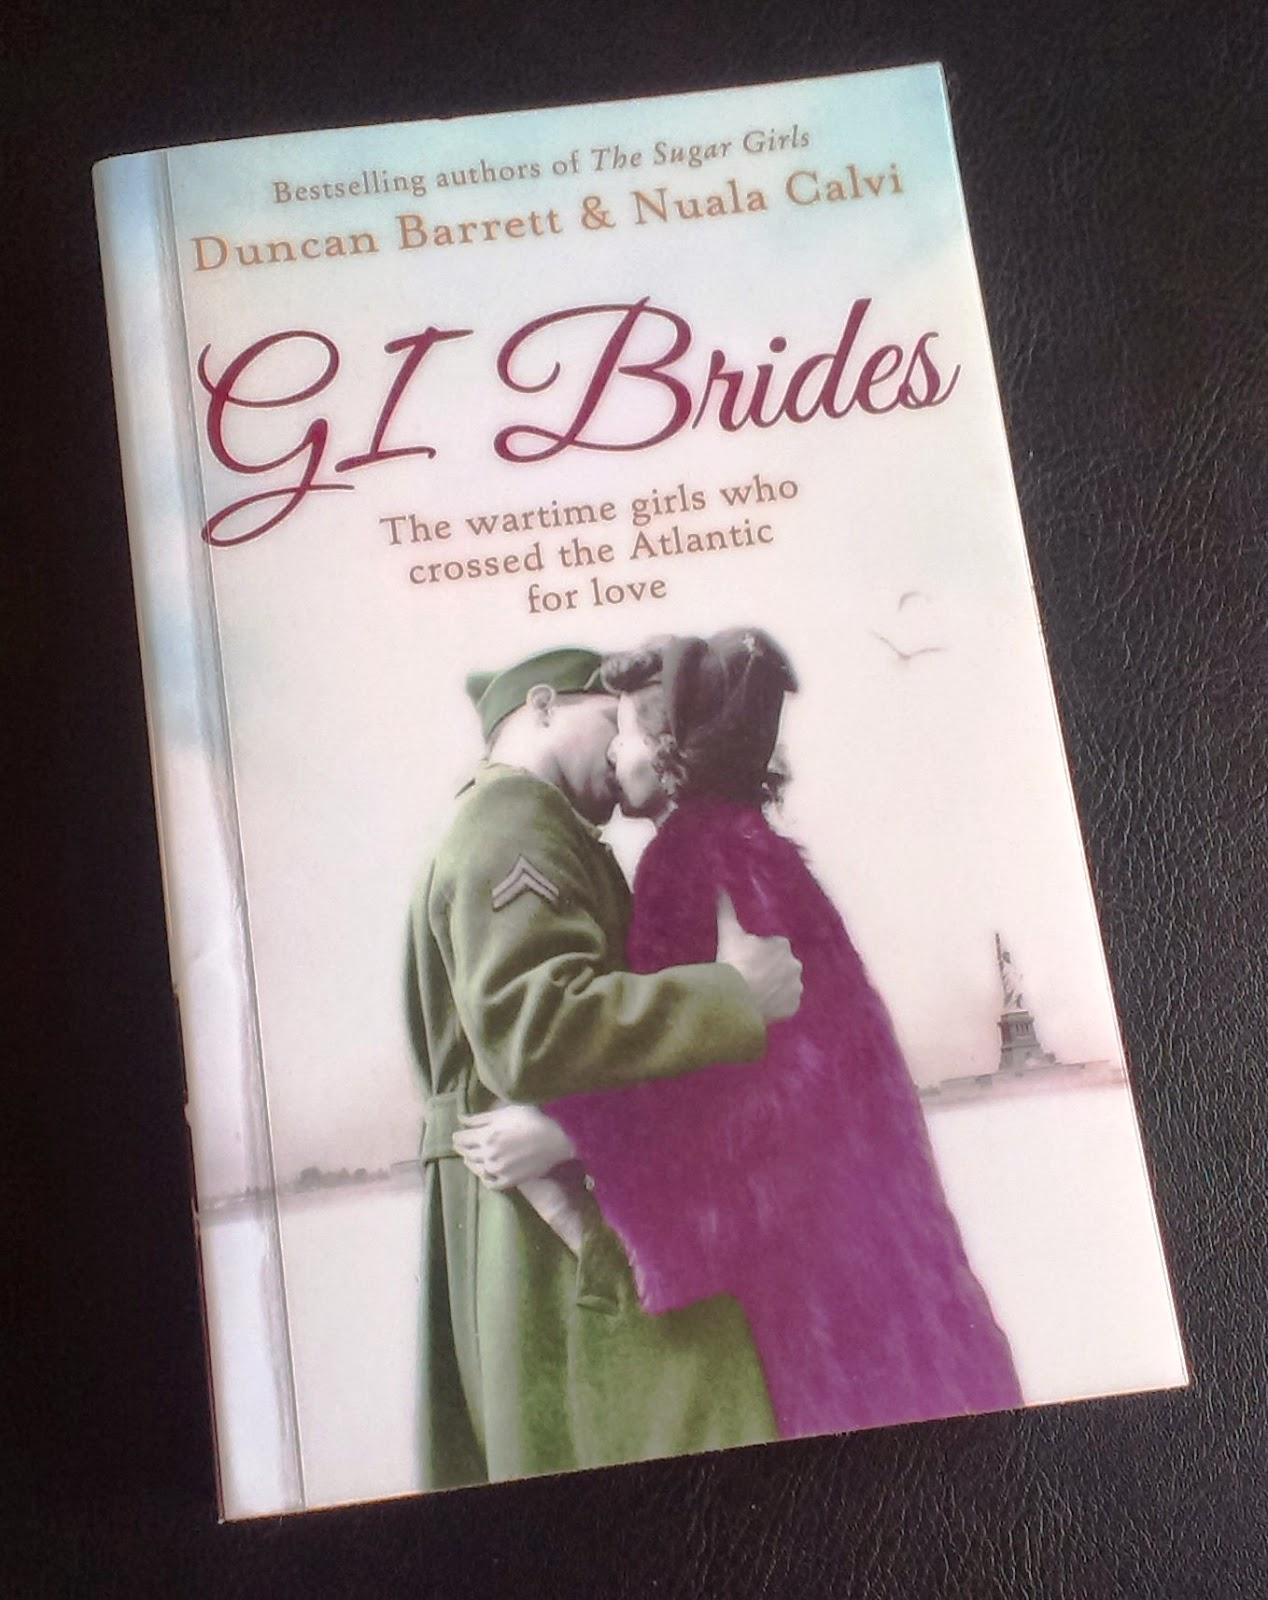 G.I. Brides by Duncan Barrett and Nuala Calvi